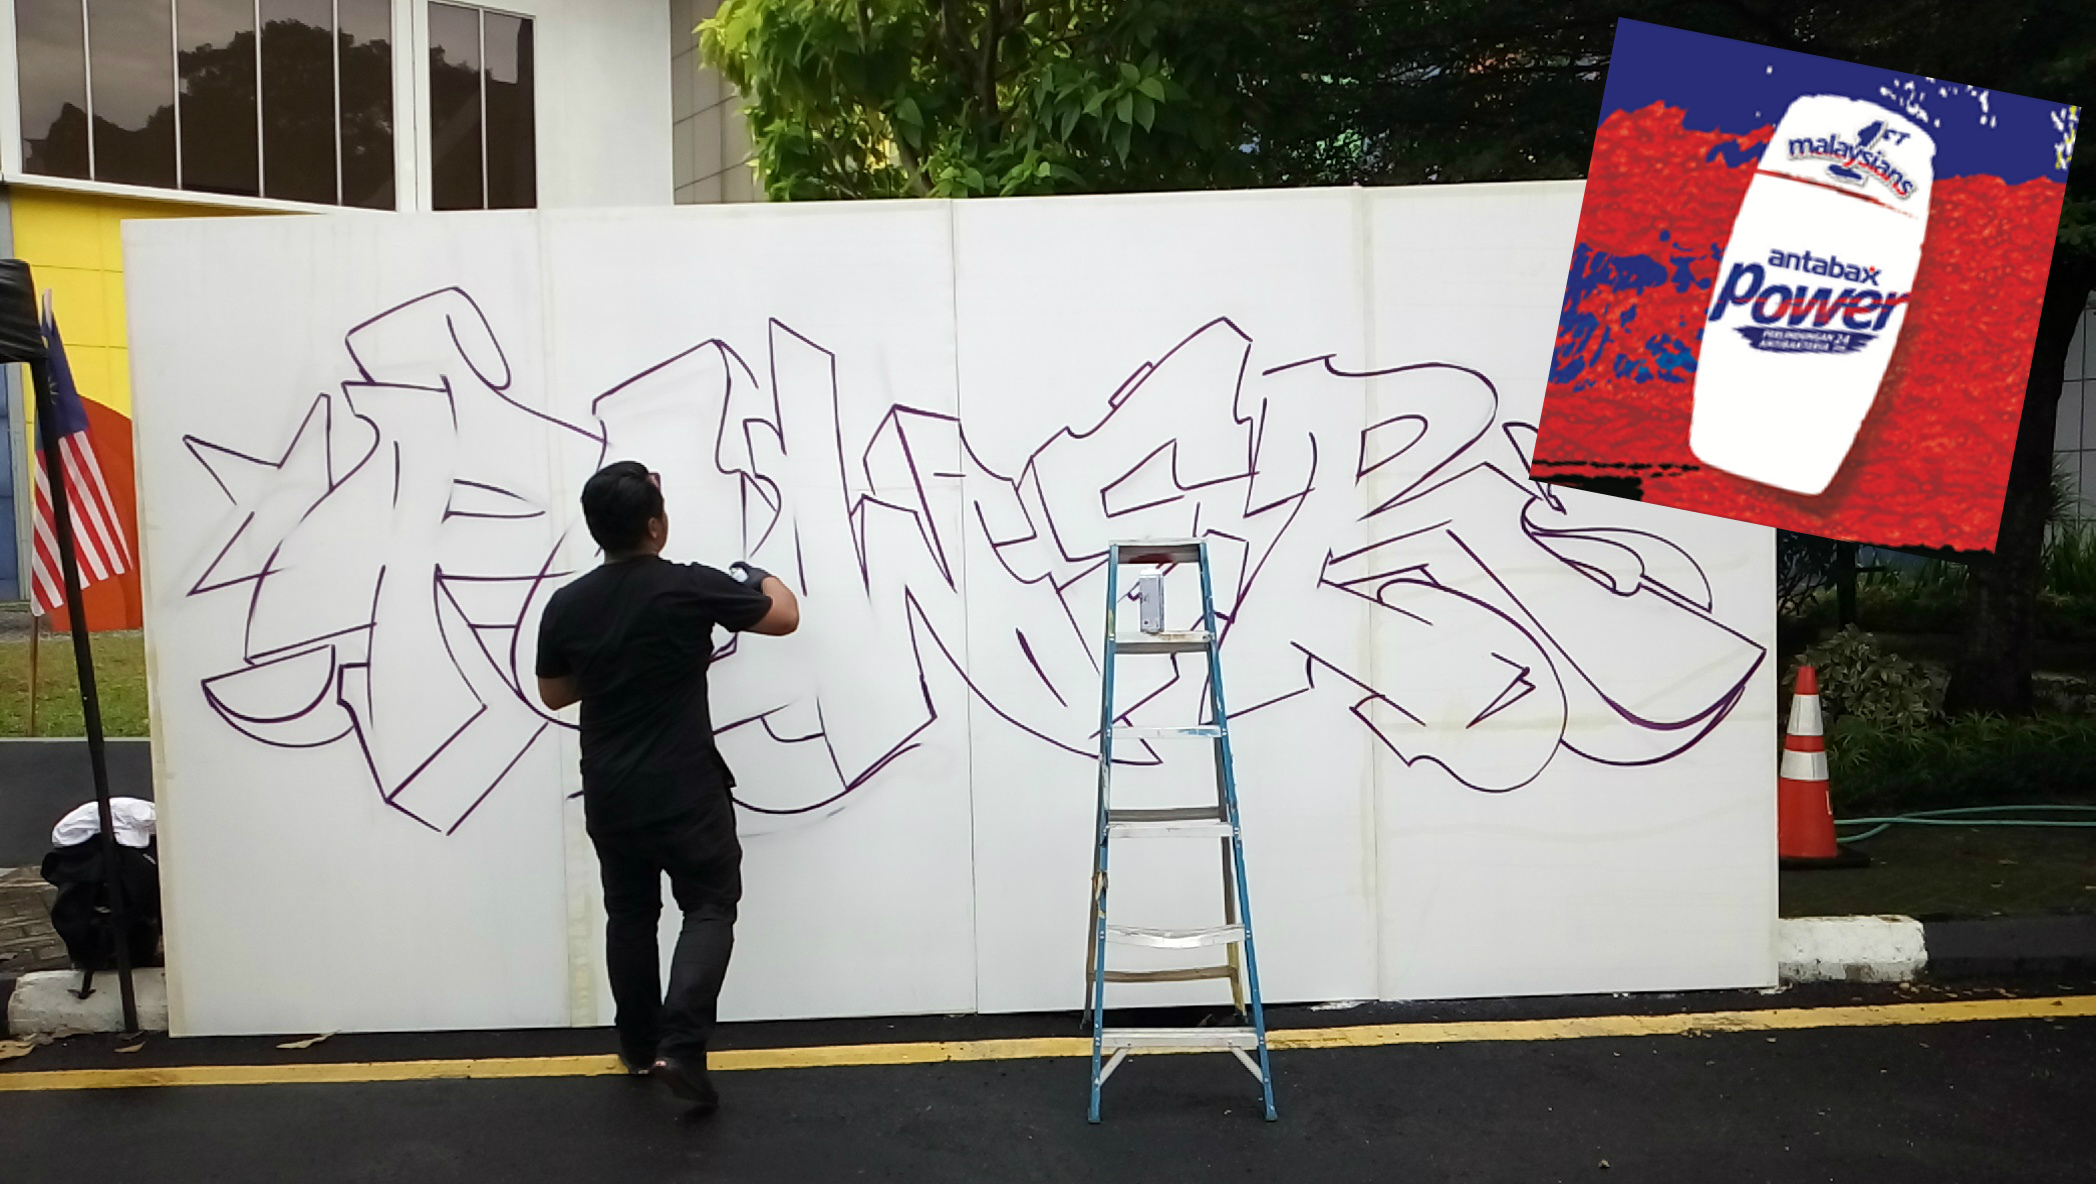 Antabax Power Live Graffiti Battle